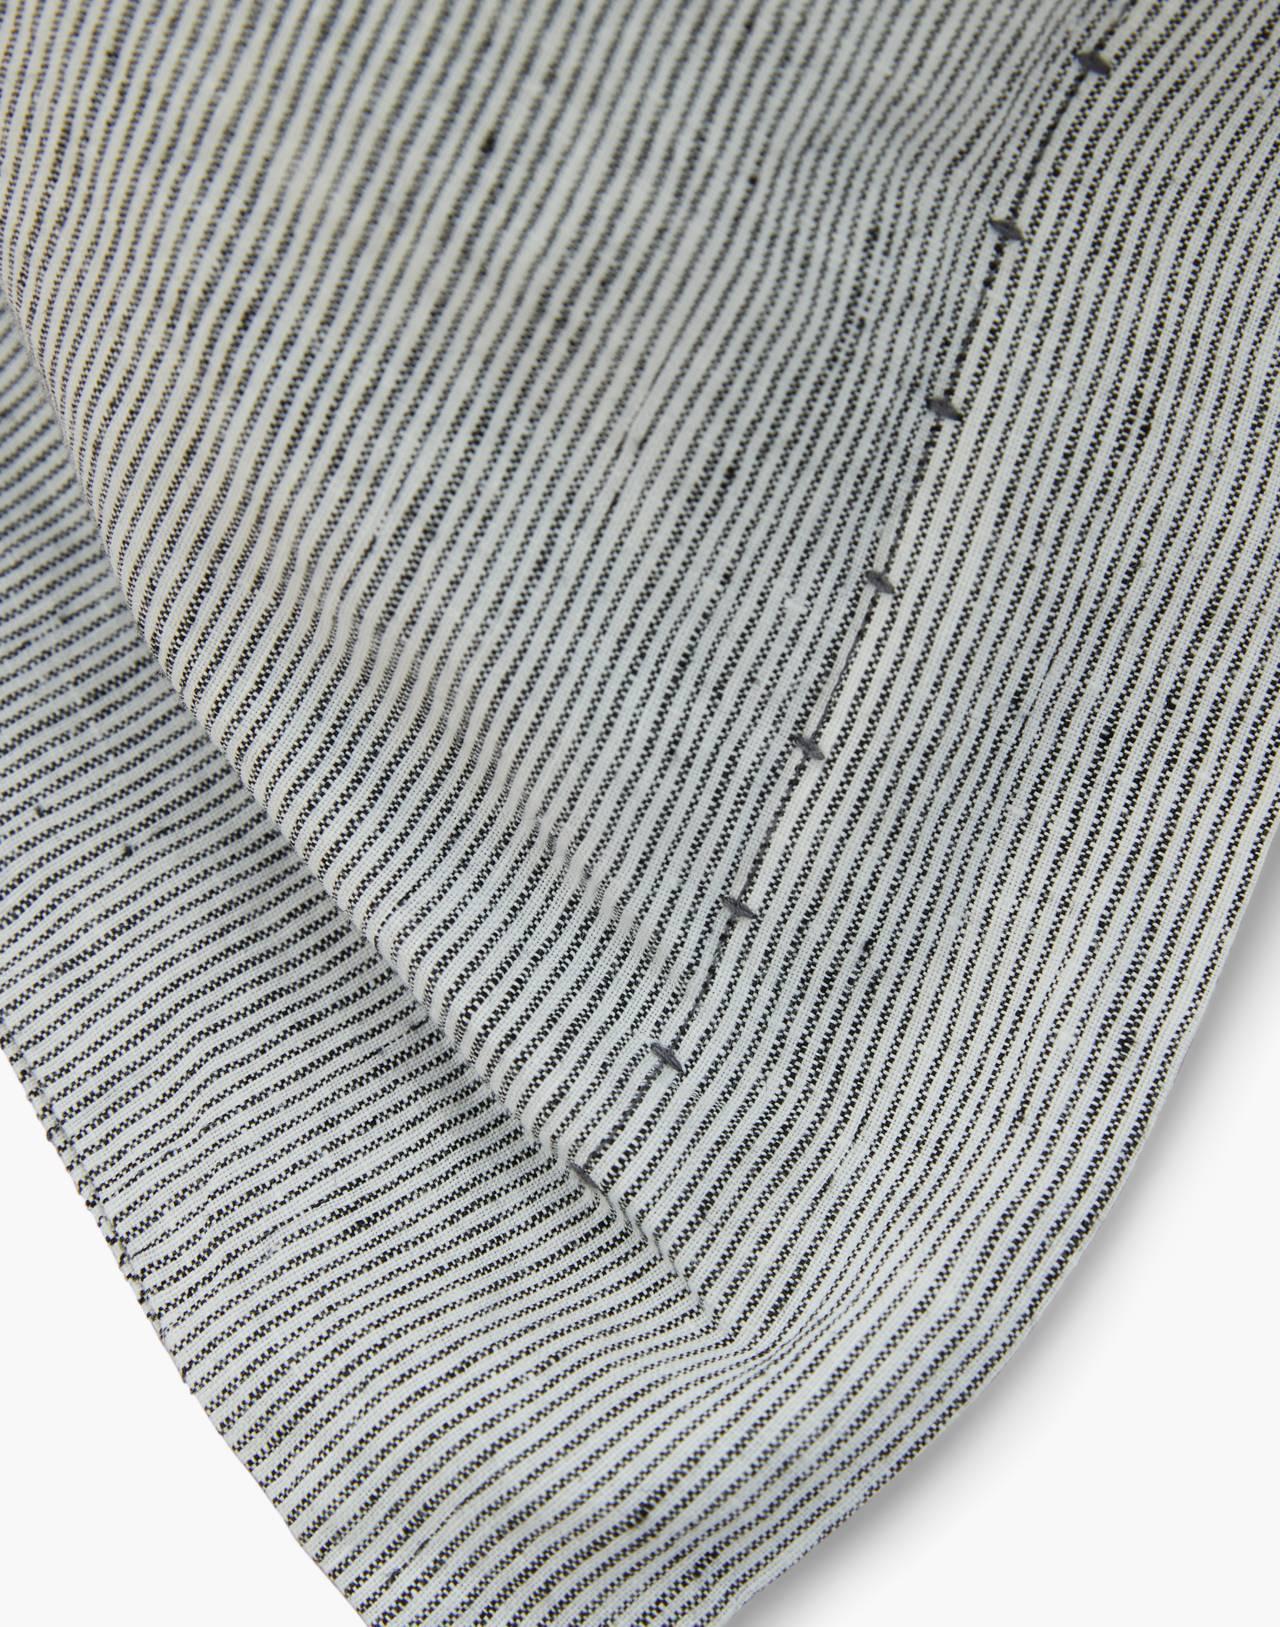 Coyuchi® Organic Linen Chambray Queen Sheet Set in gray image 2